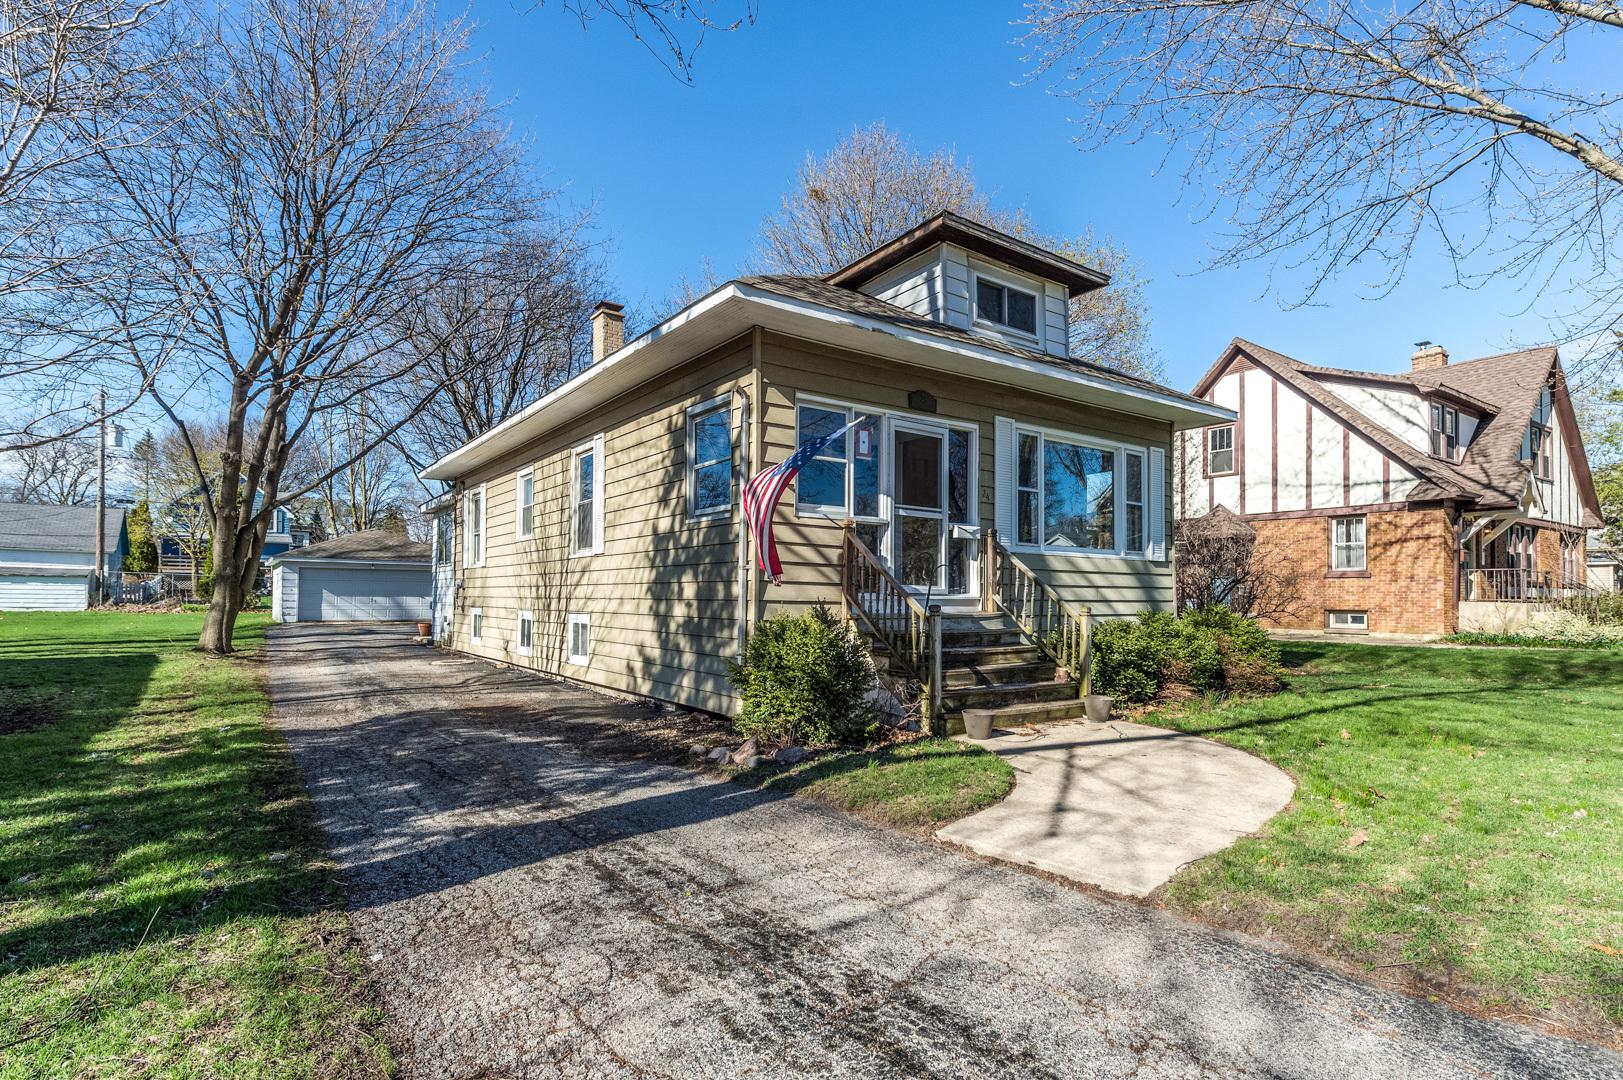 24 West Maple, Roselle, Illinois, 60172